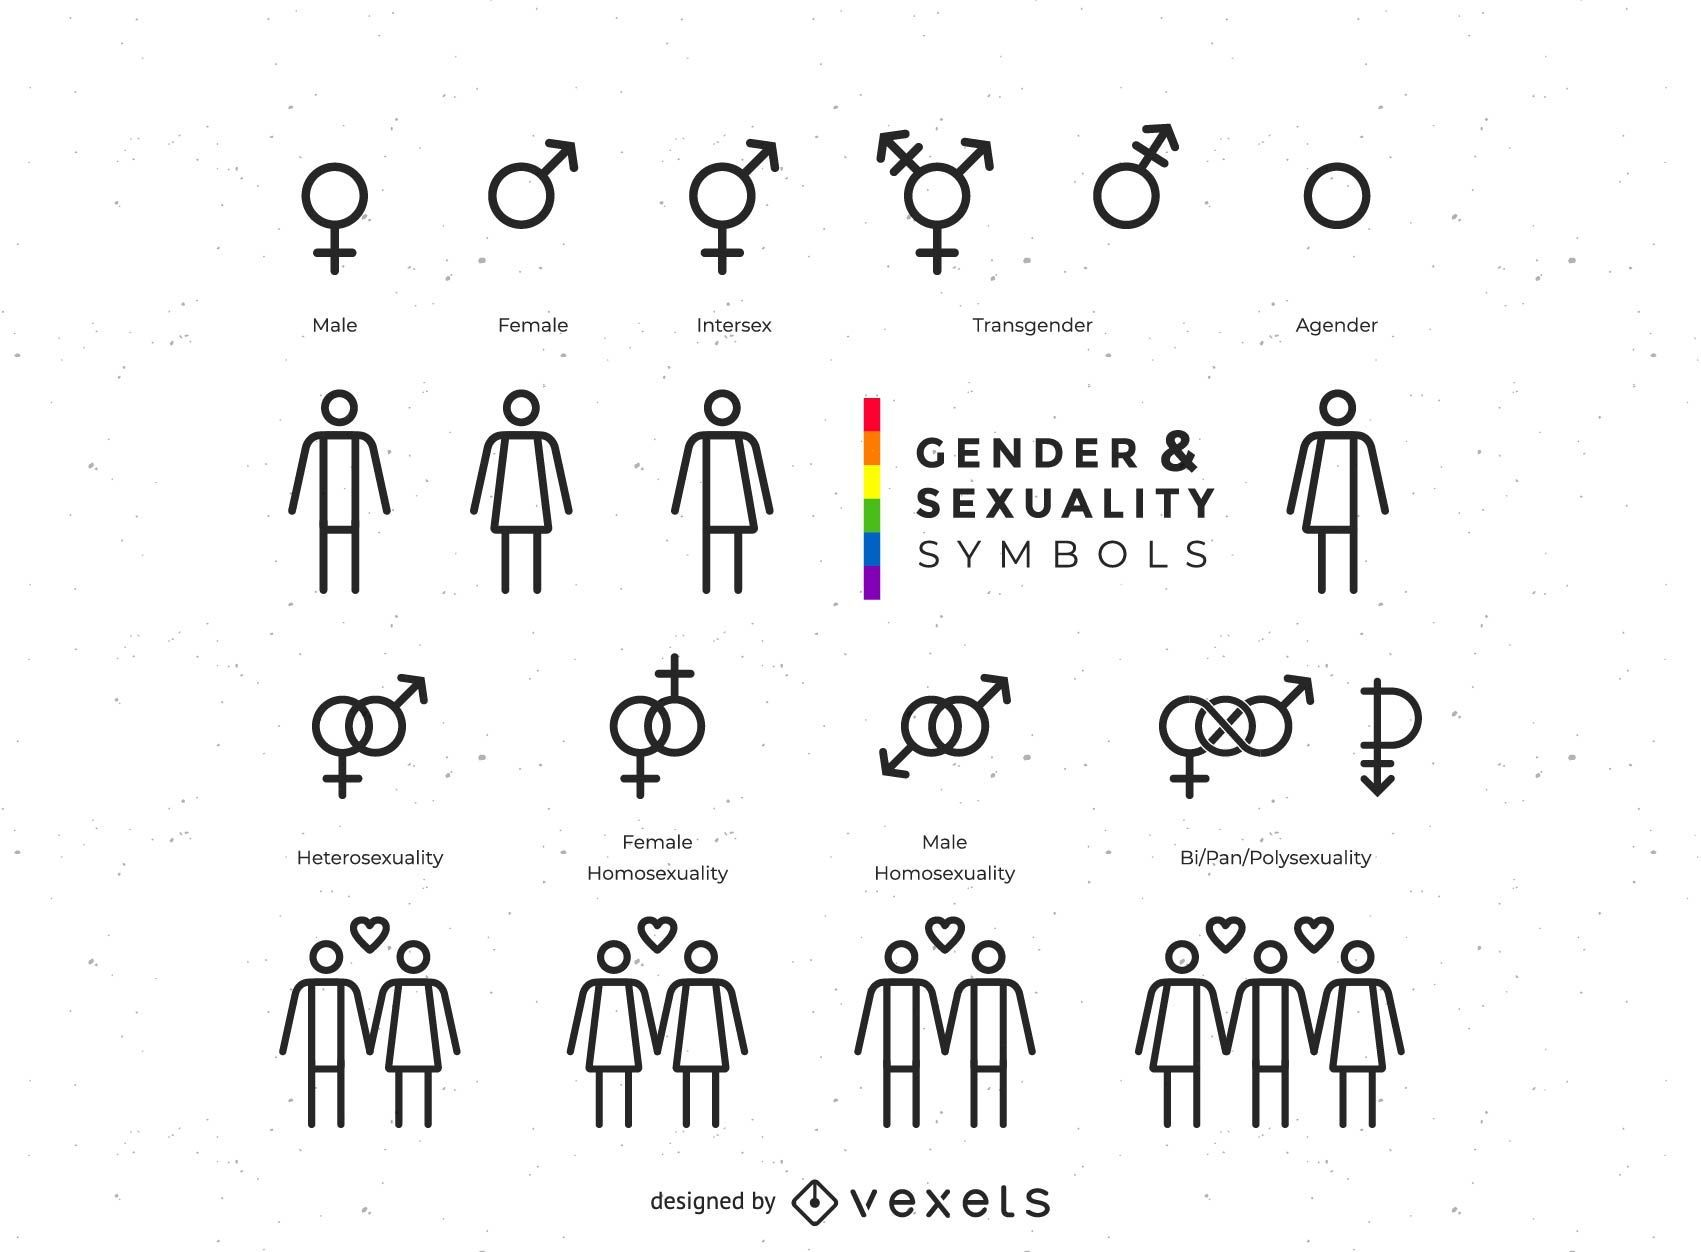 Female sexuality symbols